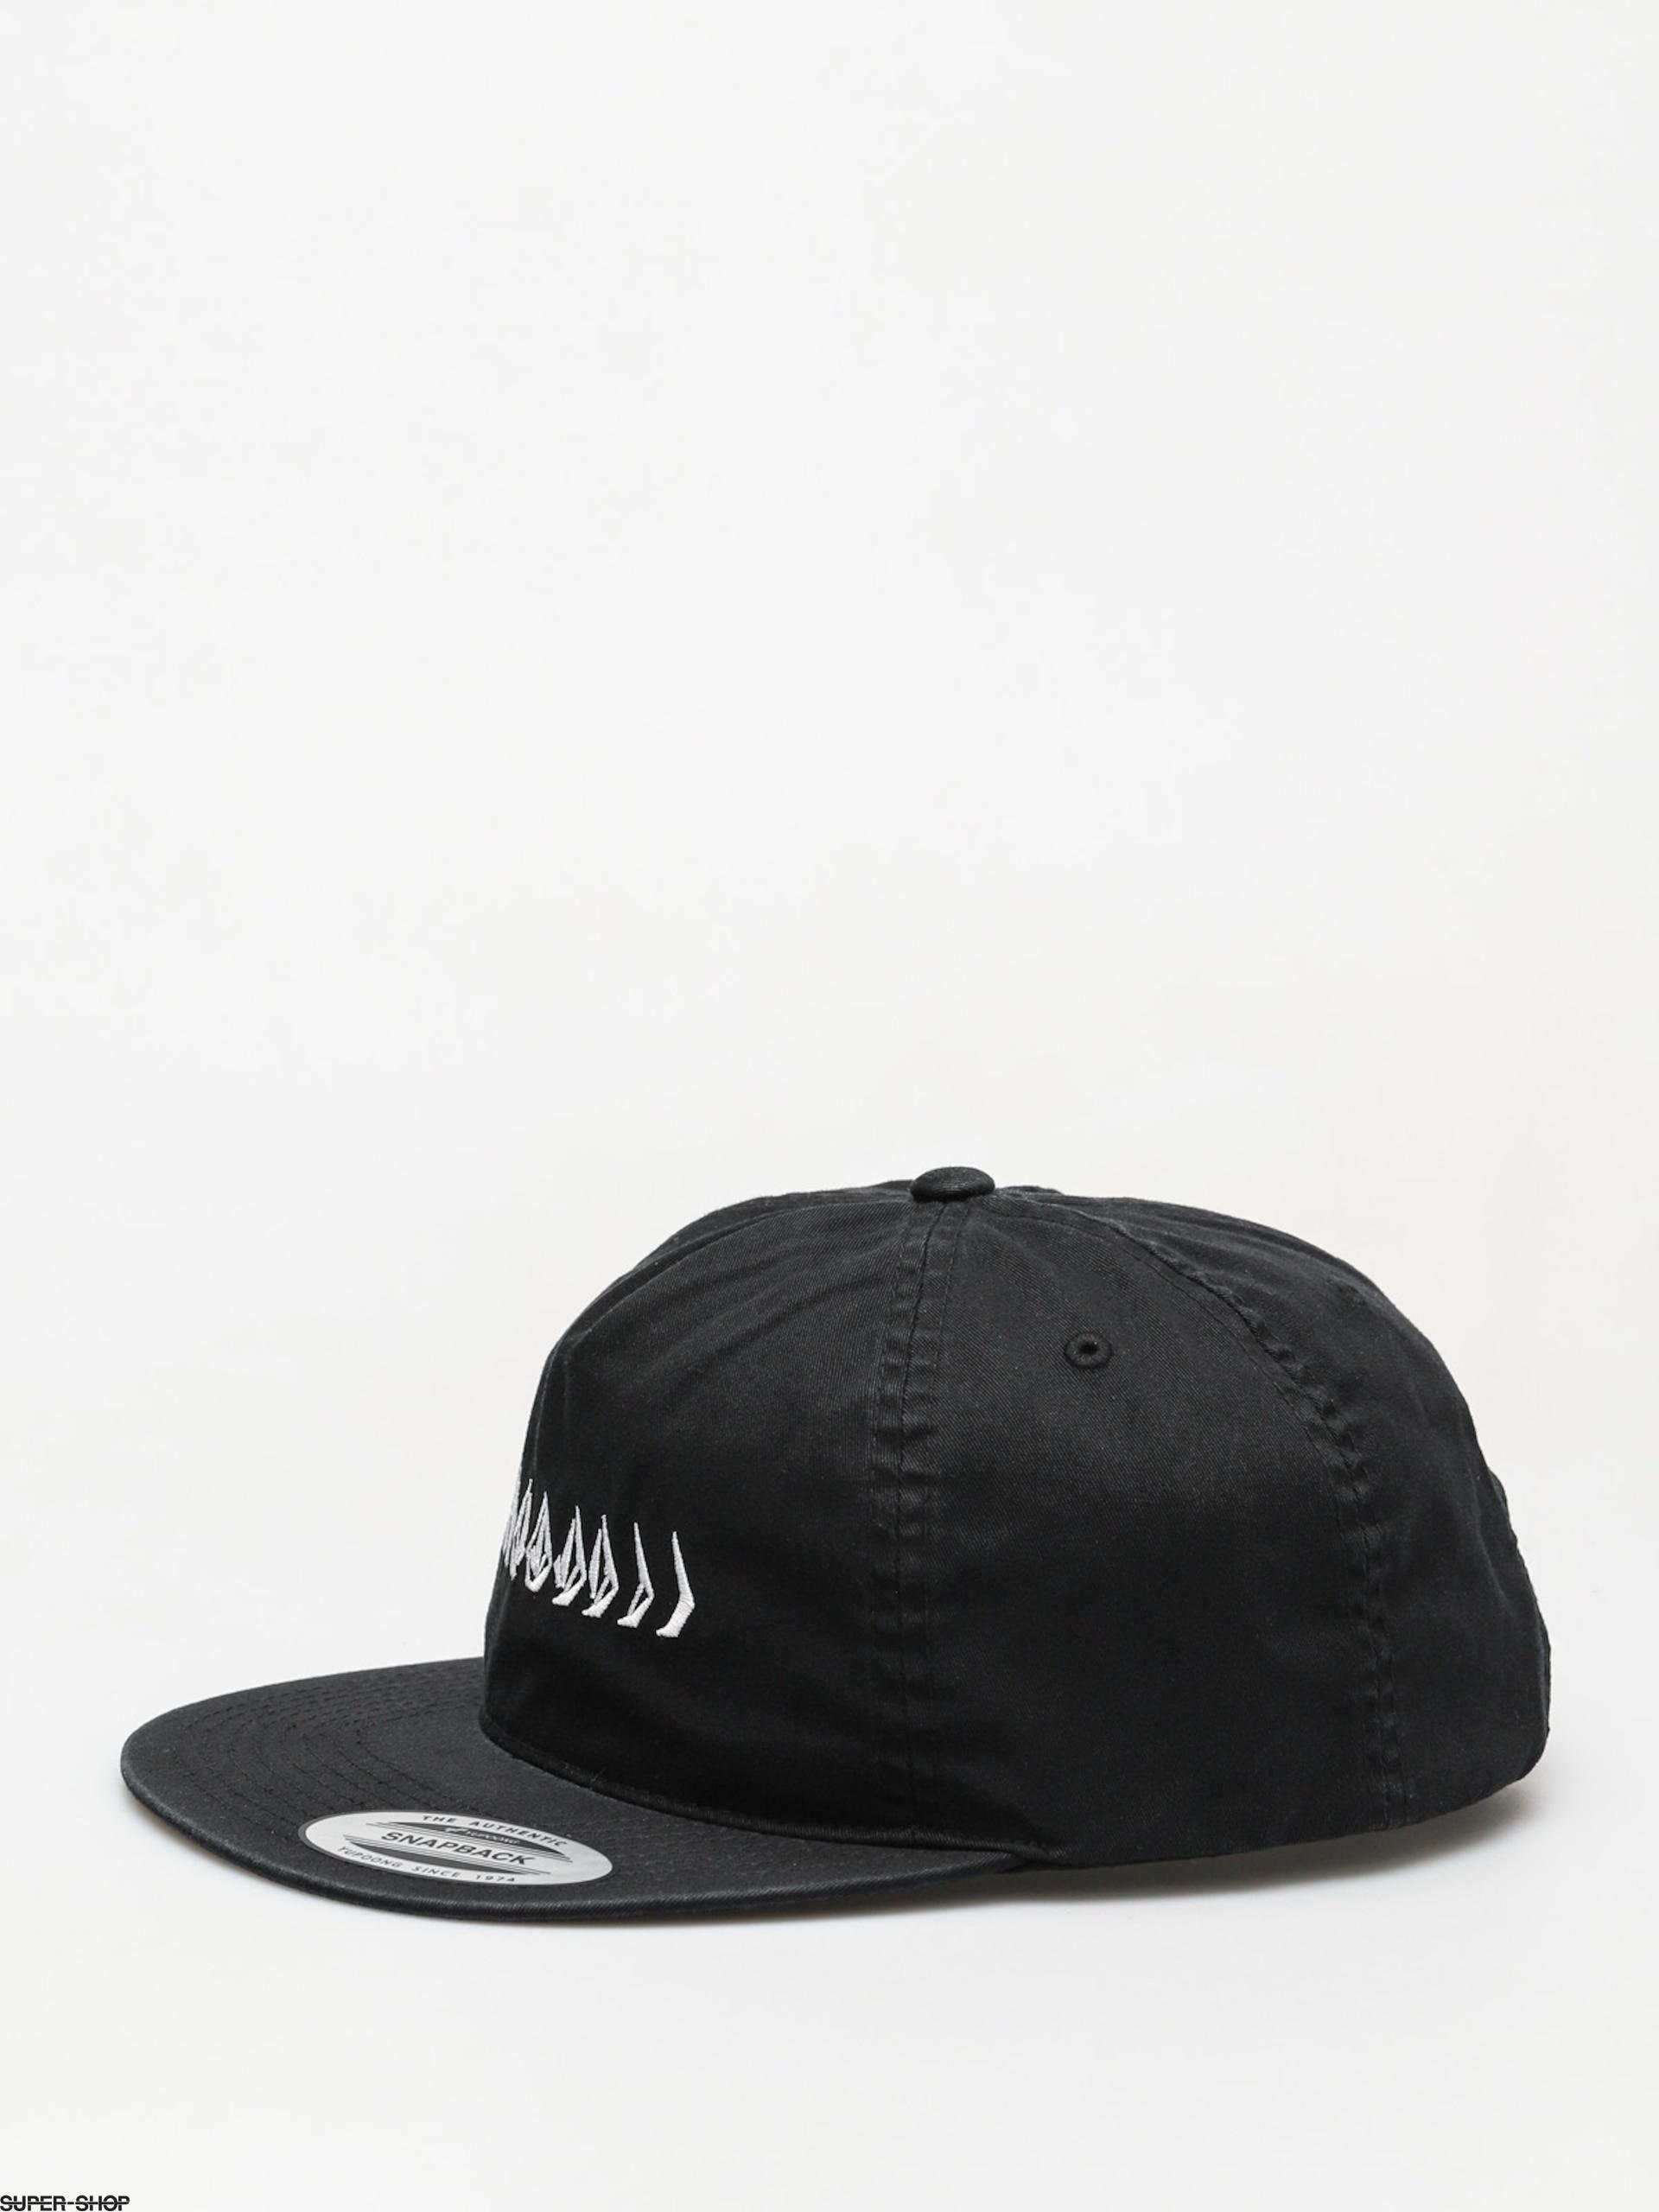 Volcom Boys Cycle Stone 5 Panel Adjustable Snap Back Hat